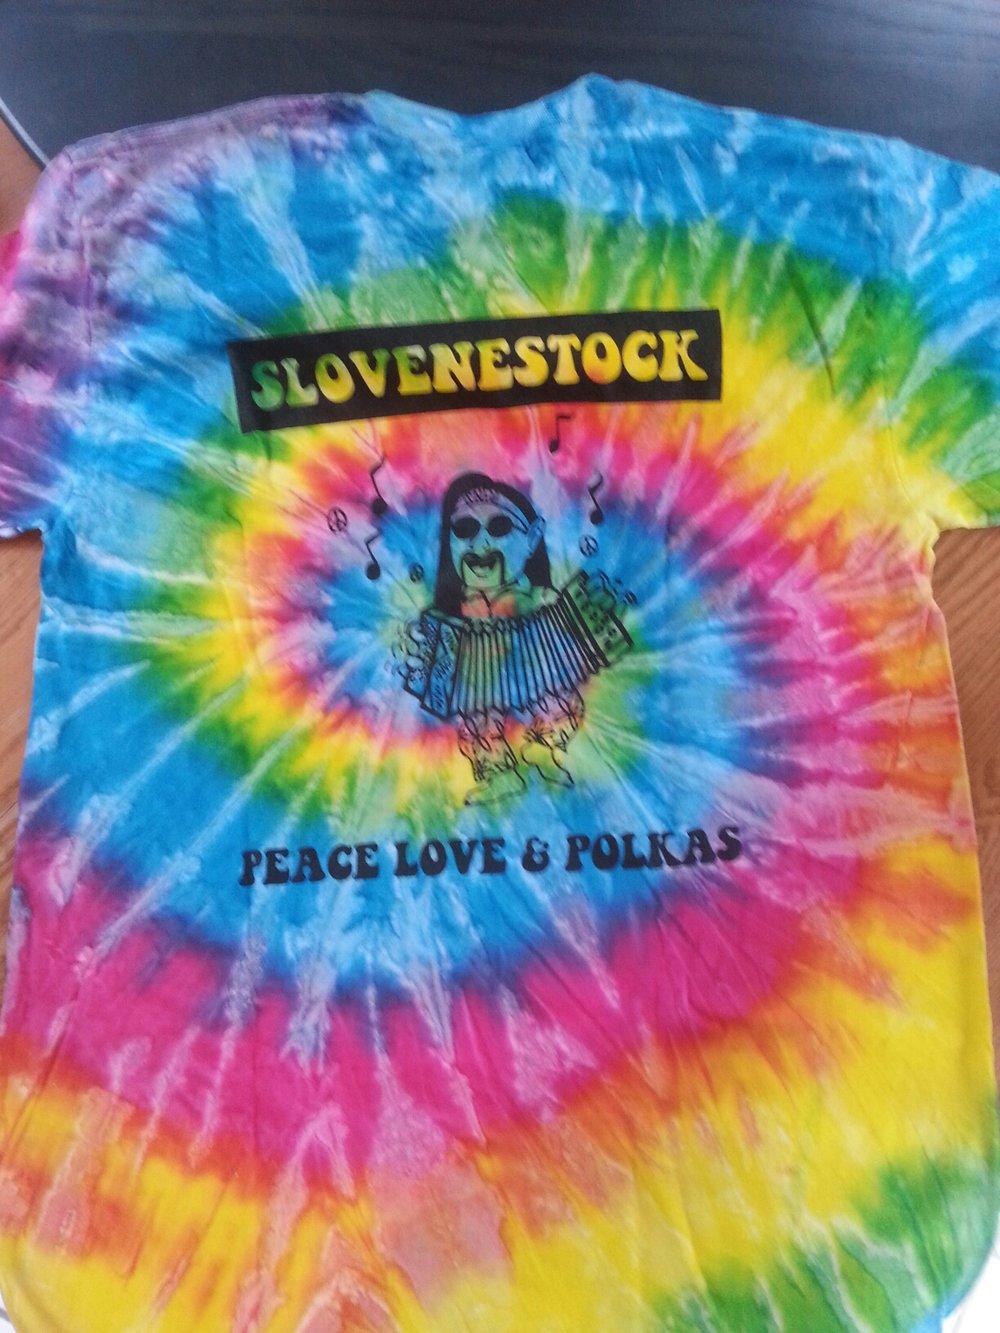 Slovenestock Tshirt back.jpg